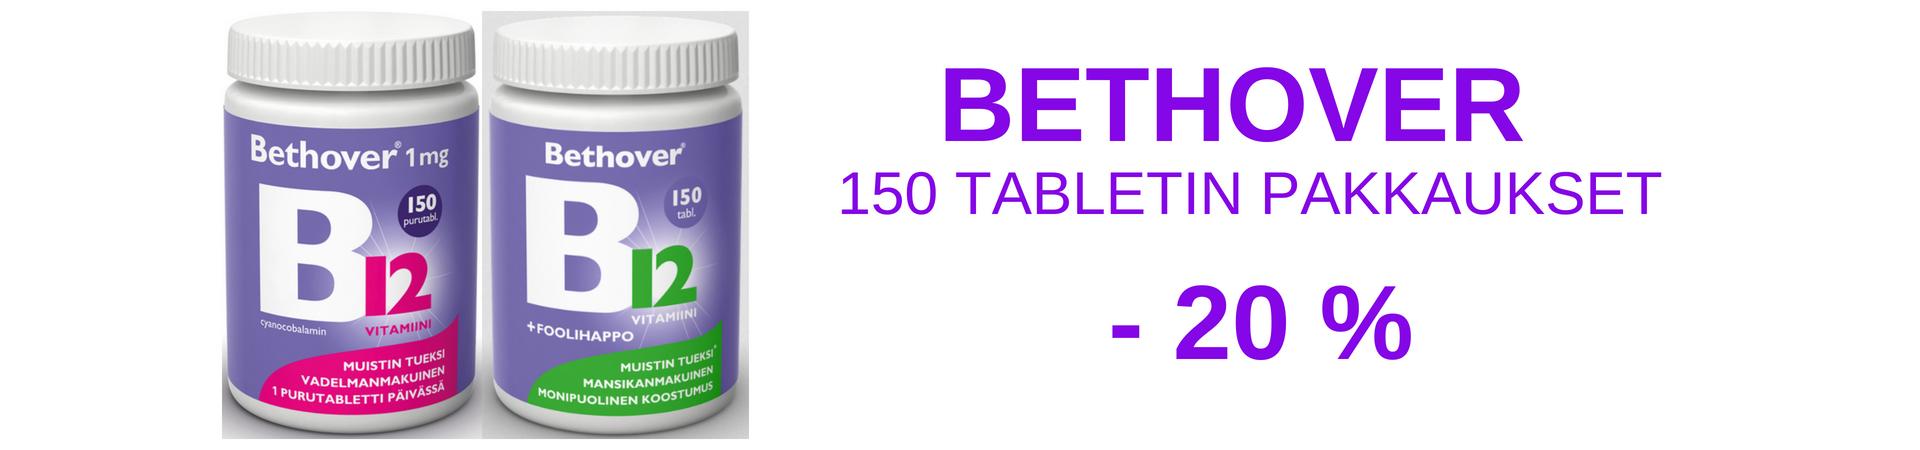 Bethover -20%